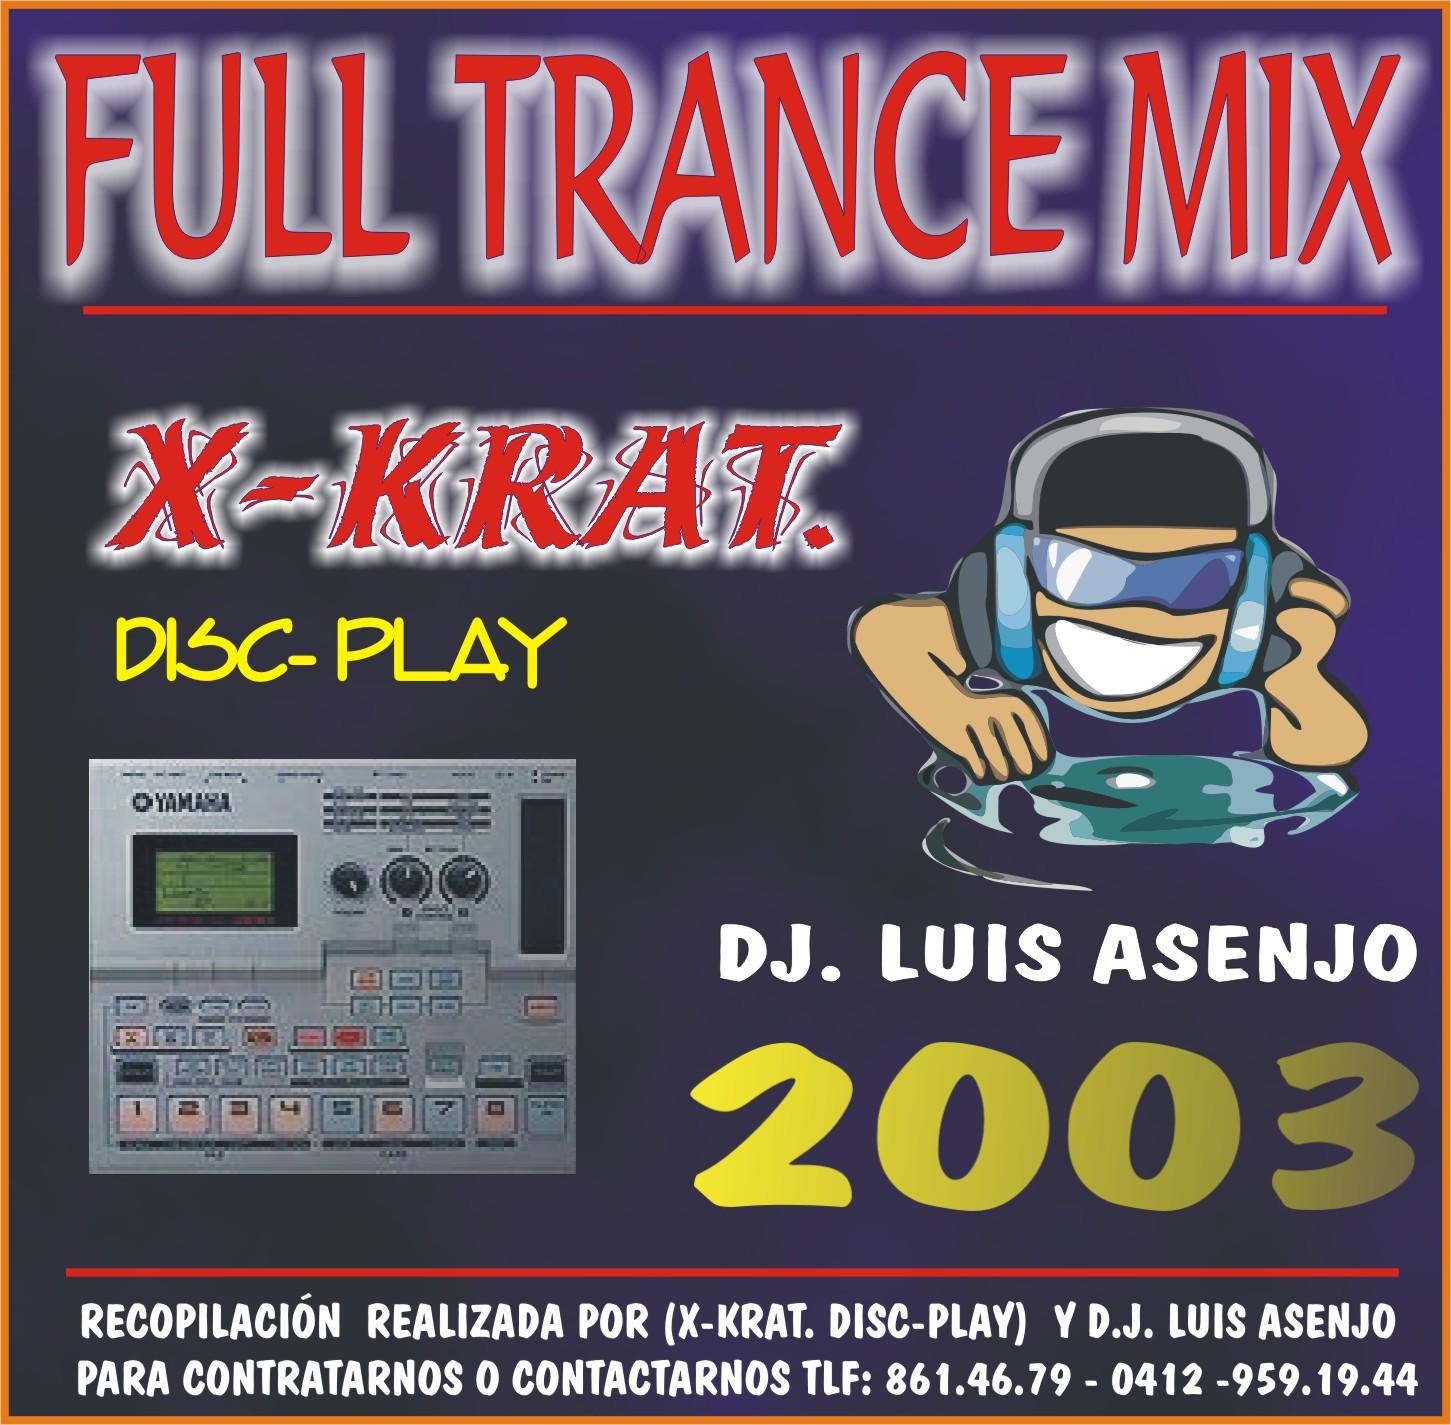 FULL TRANCE MIX 2003